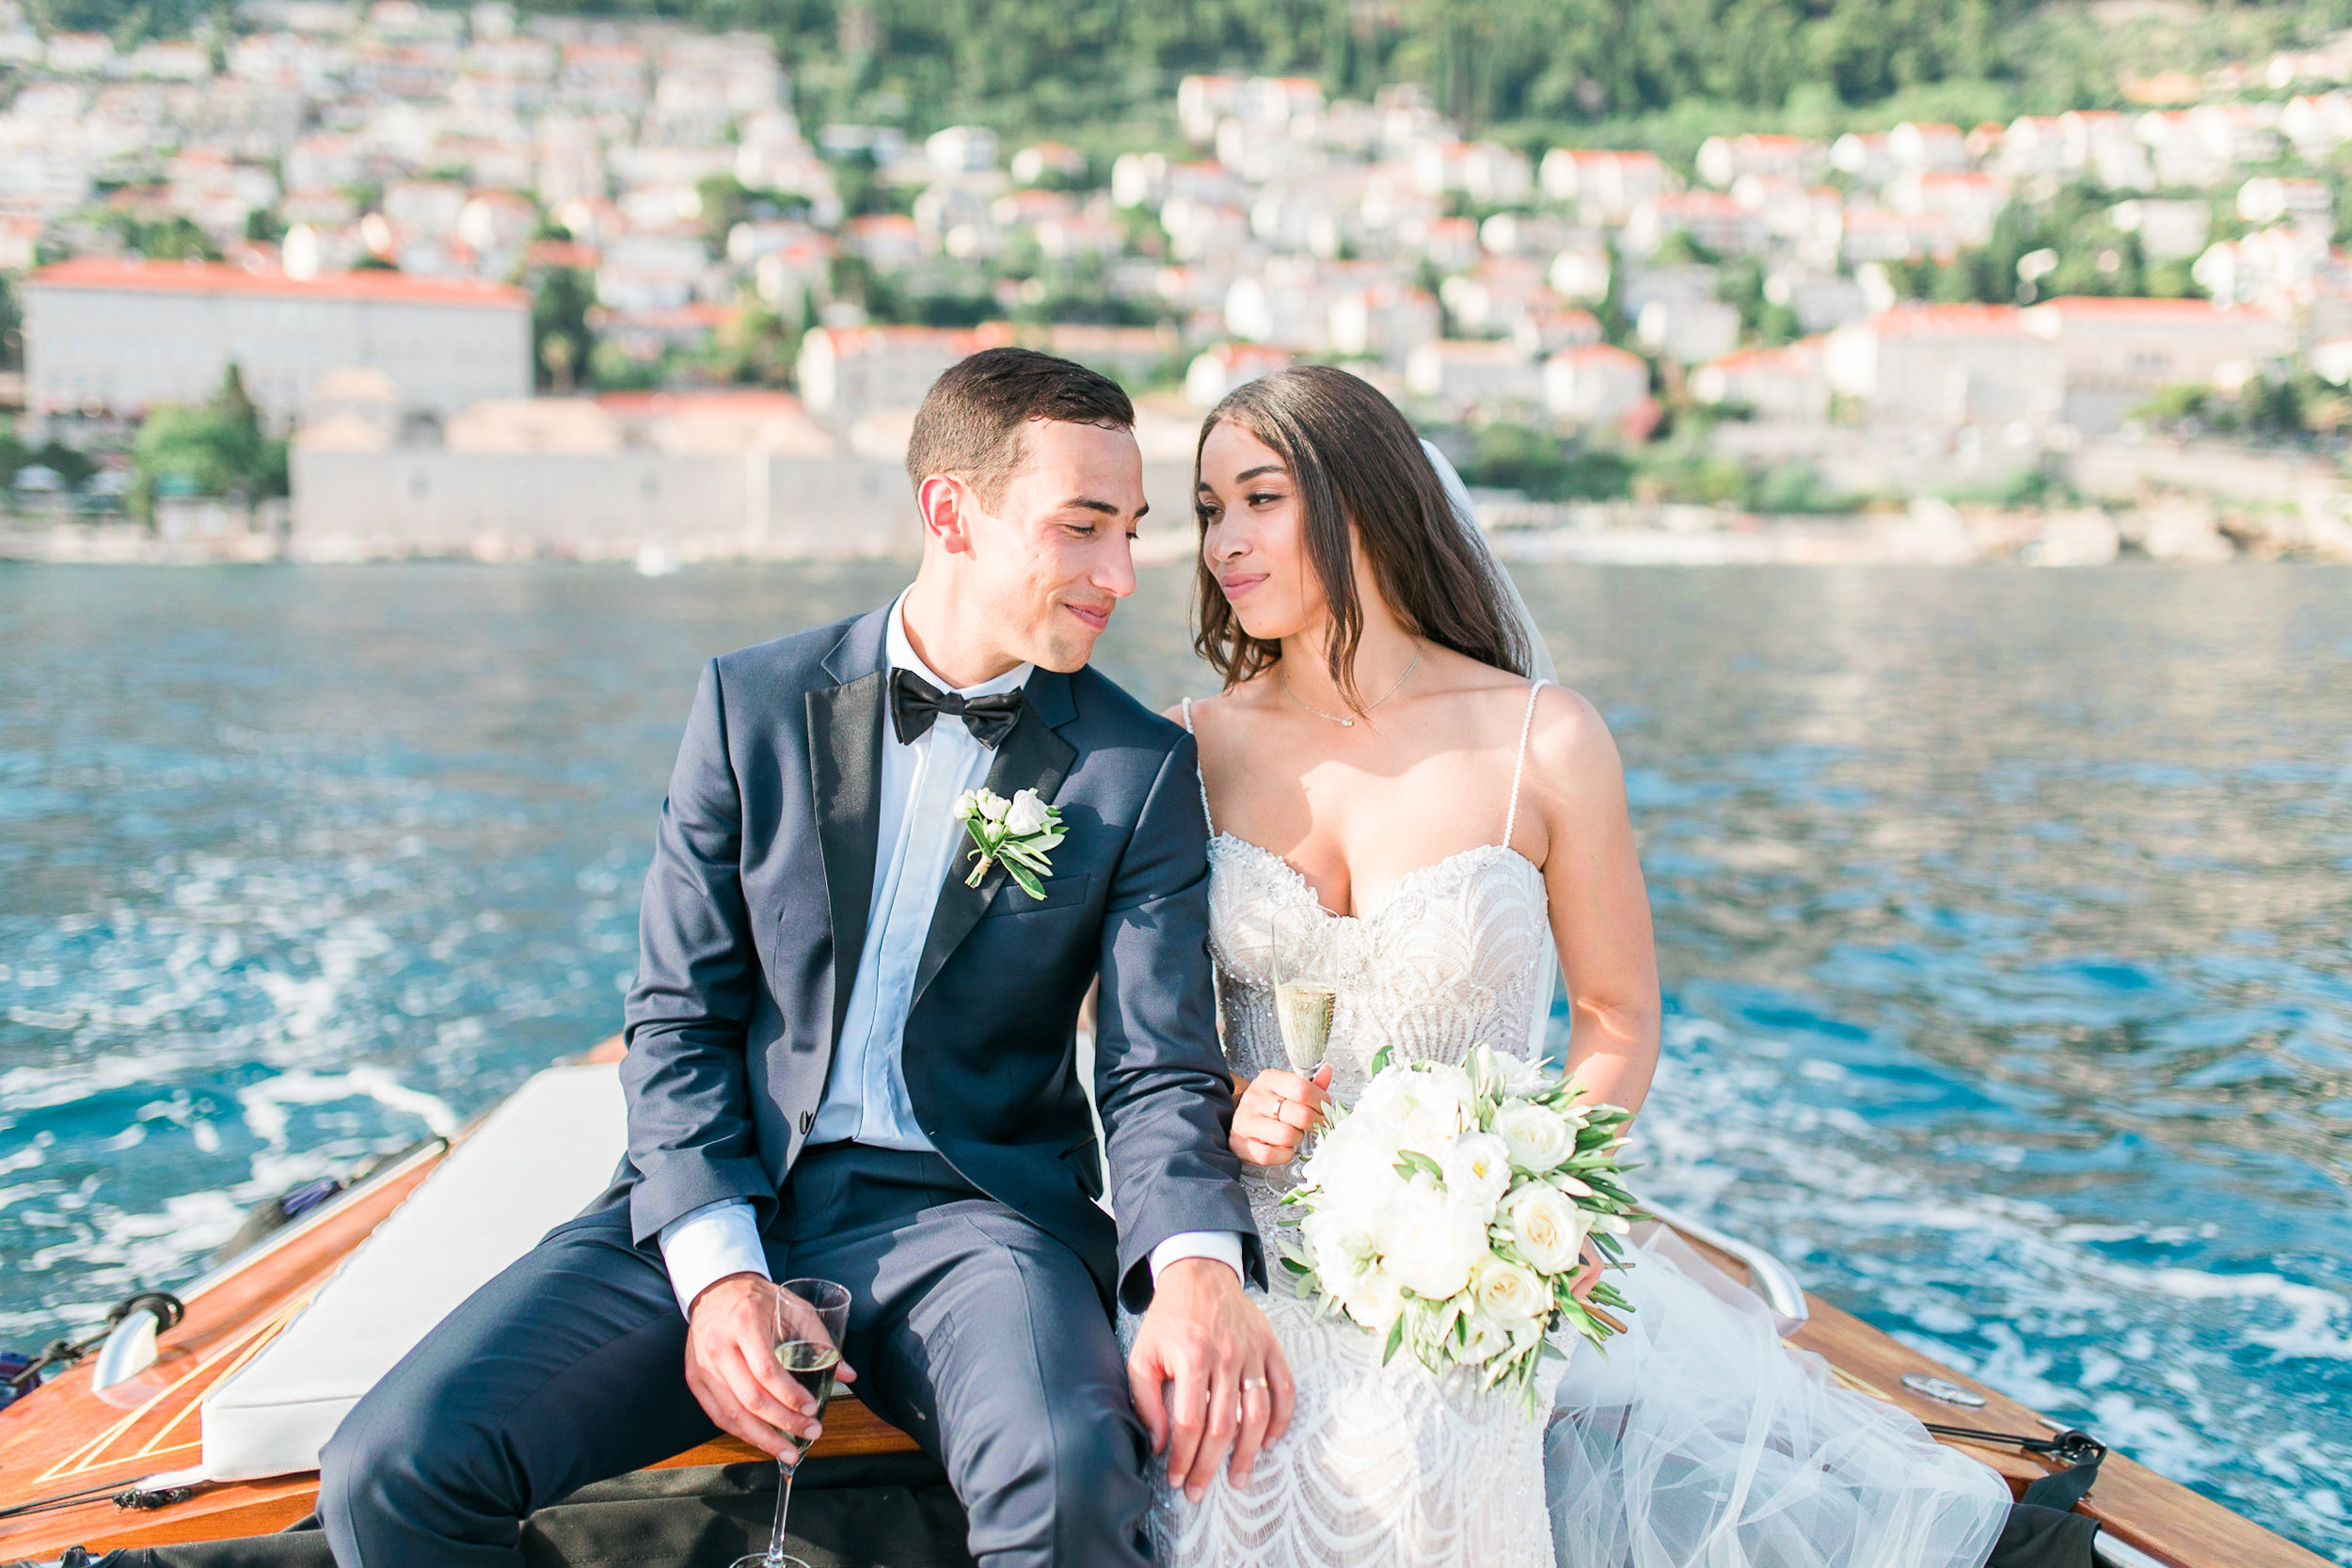 Dubrovnik-Wedding-Photographer-Croatia-Wedding-Photos-JBJ-Pictures-25.jpg